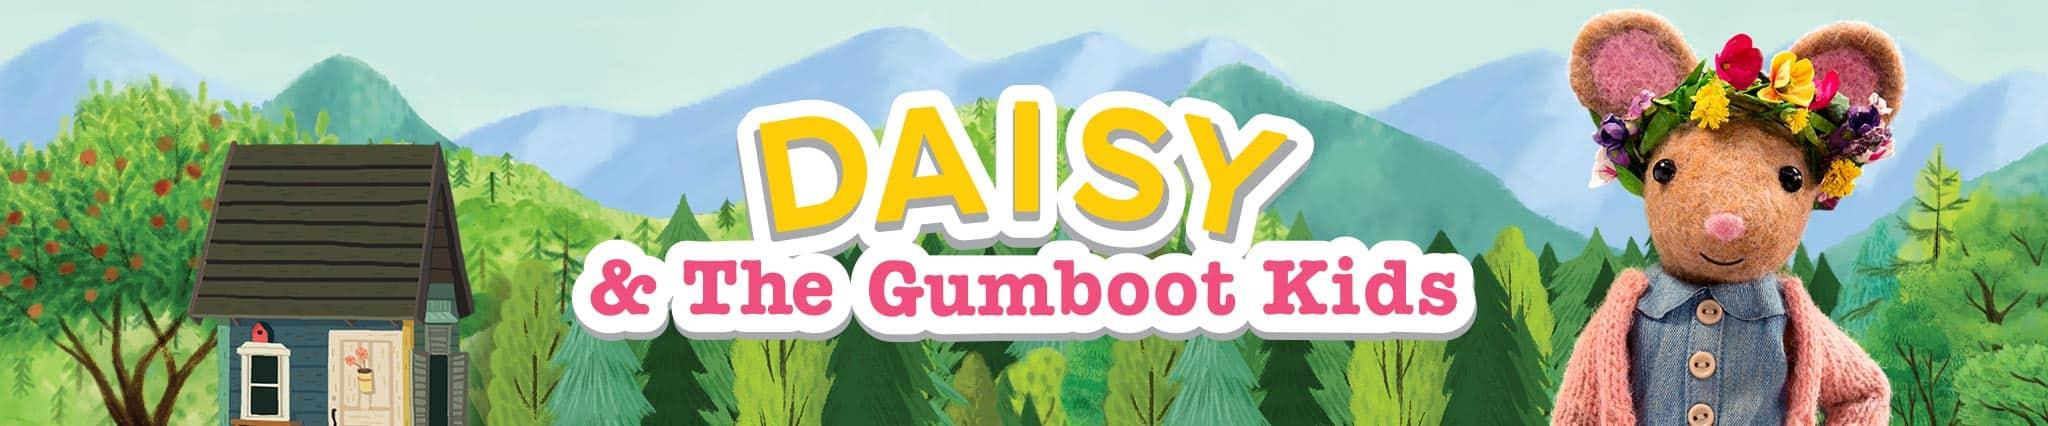 Daisy & the Gumboot Kids